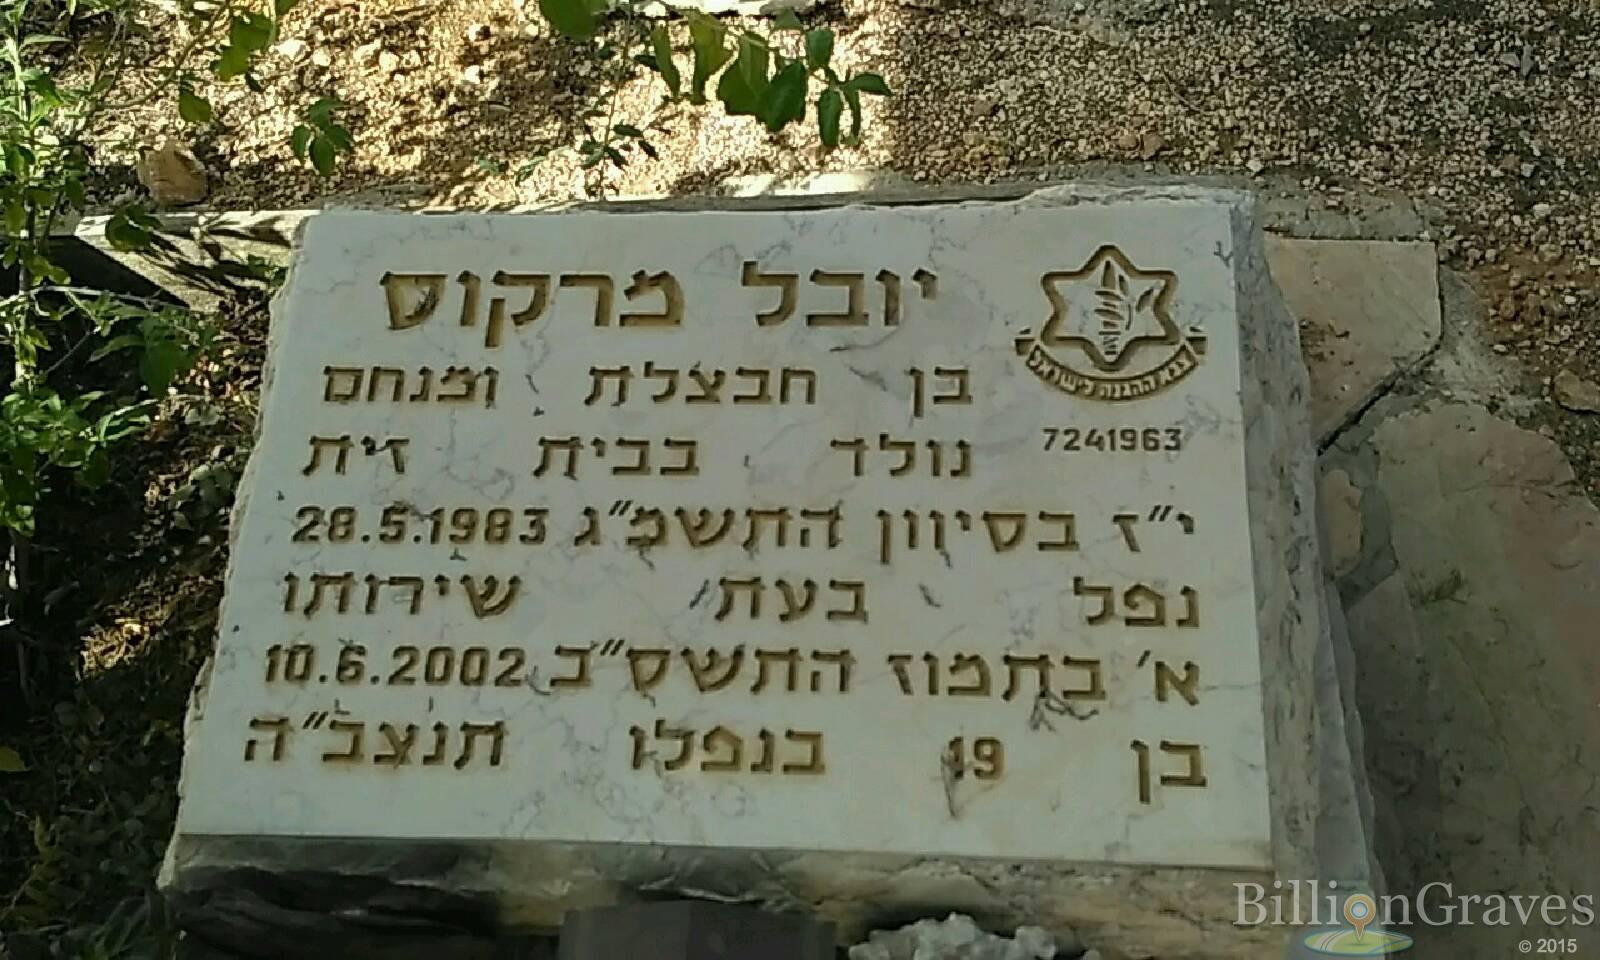 BillionGraves, Jewish, genealogy, family history, GPS, BillionGraves app, Israel, Jew, Hebrew, cemetery, grave, gravestone, star